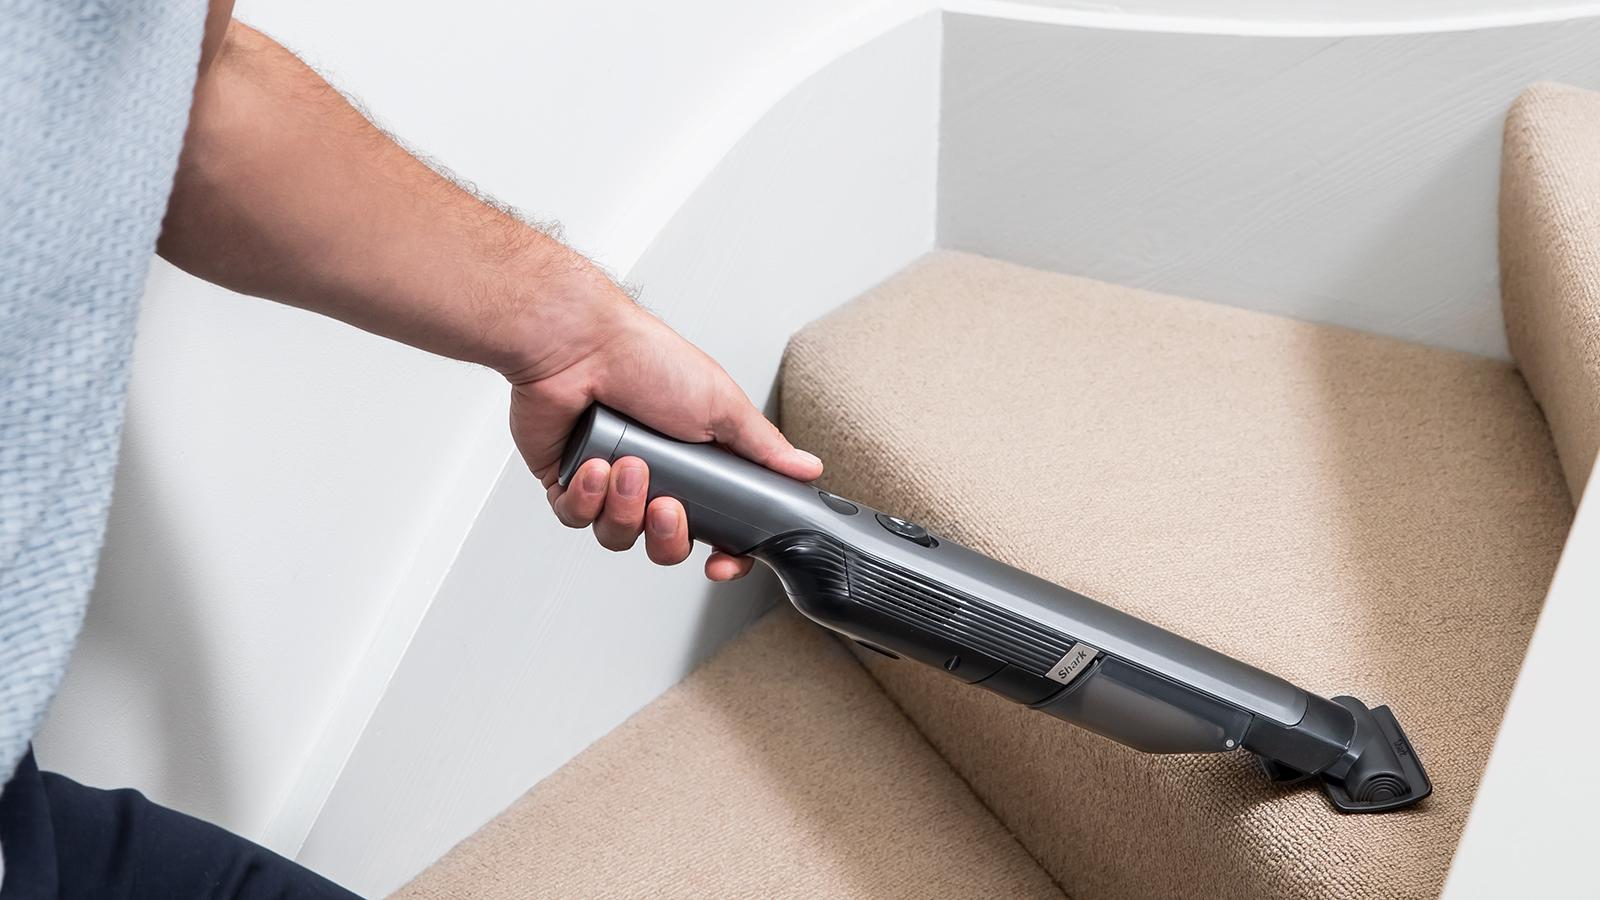 Shark Cordless Handheld Vacuum Cleaner Single Battery